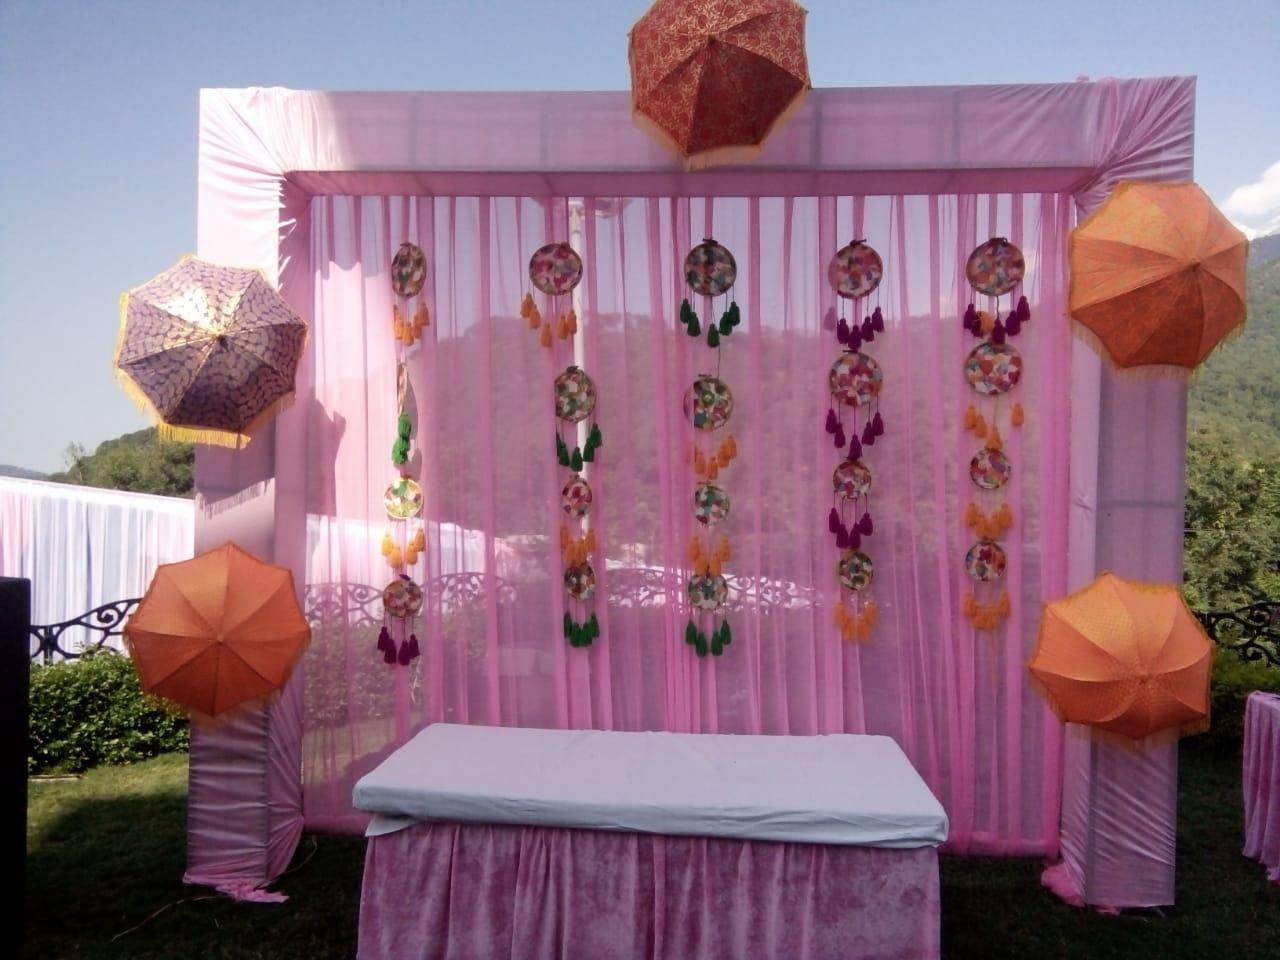 pink decor with orange umbrellas